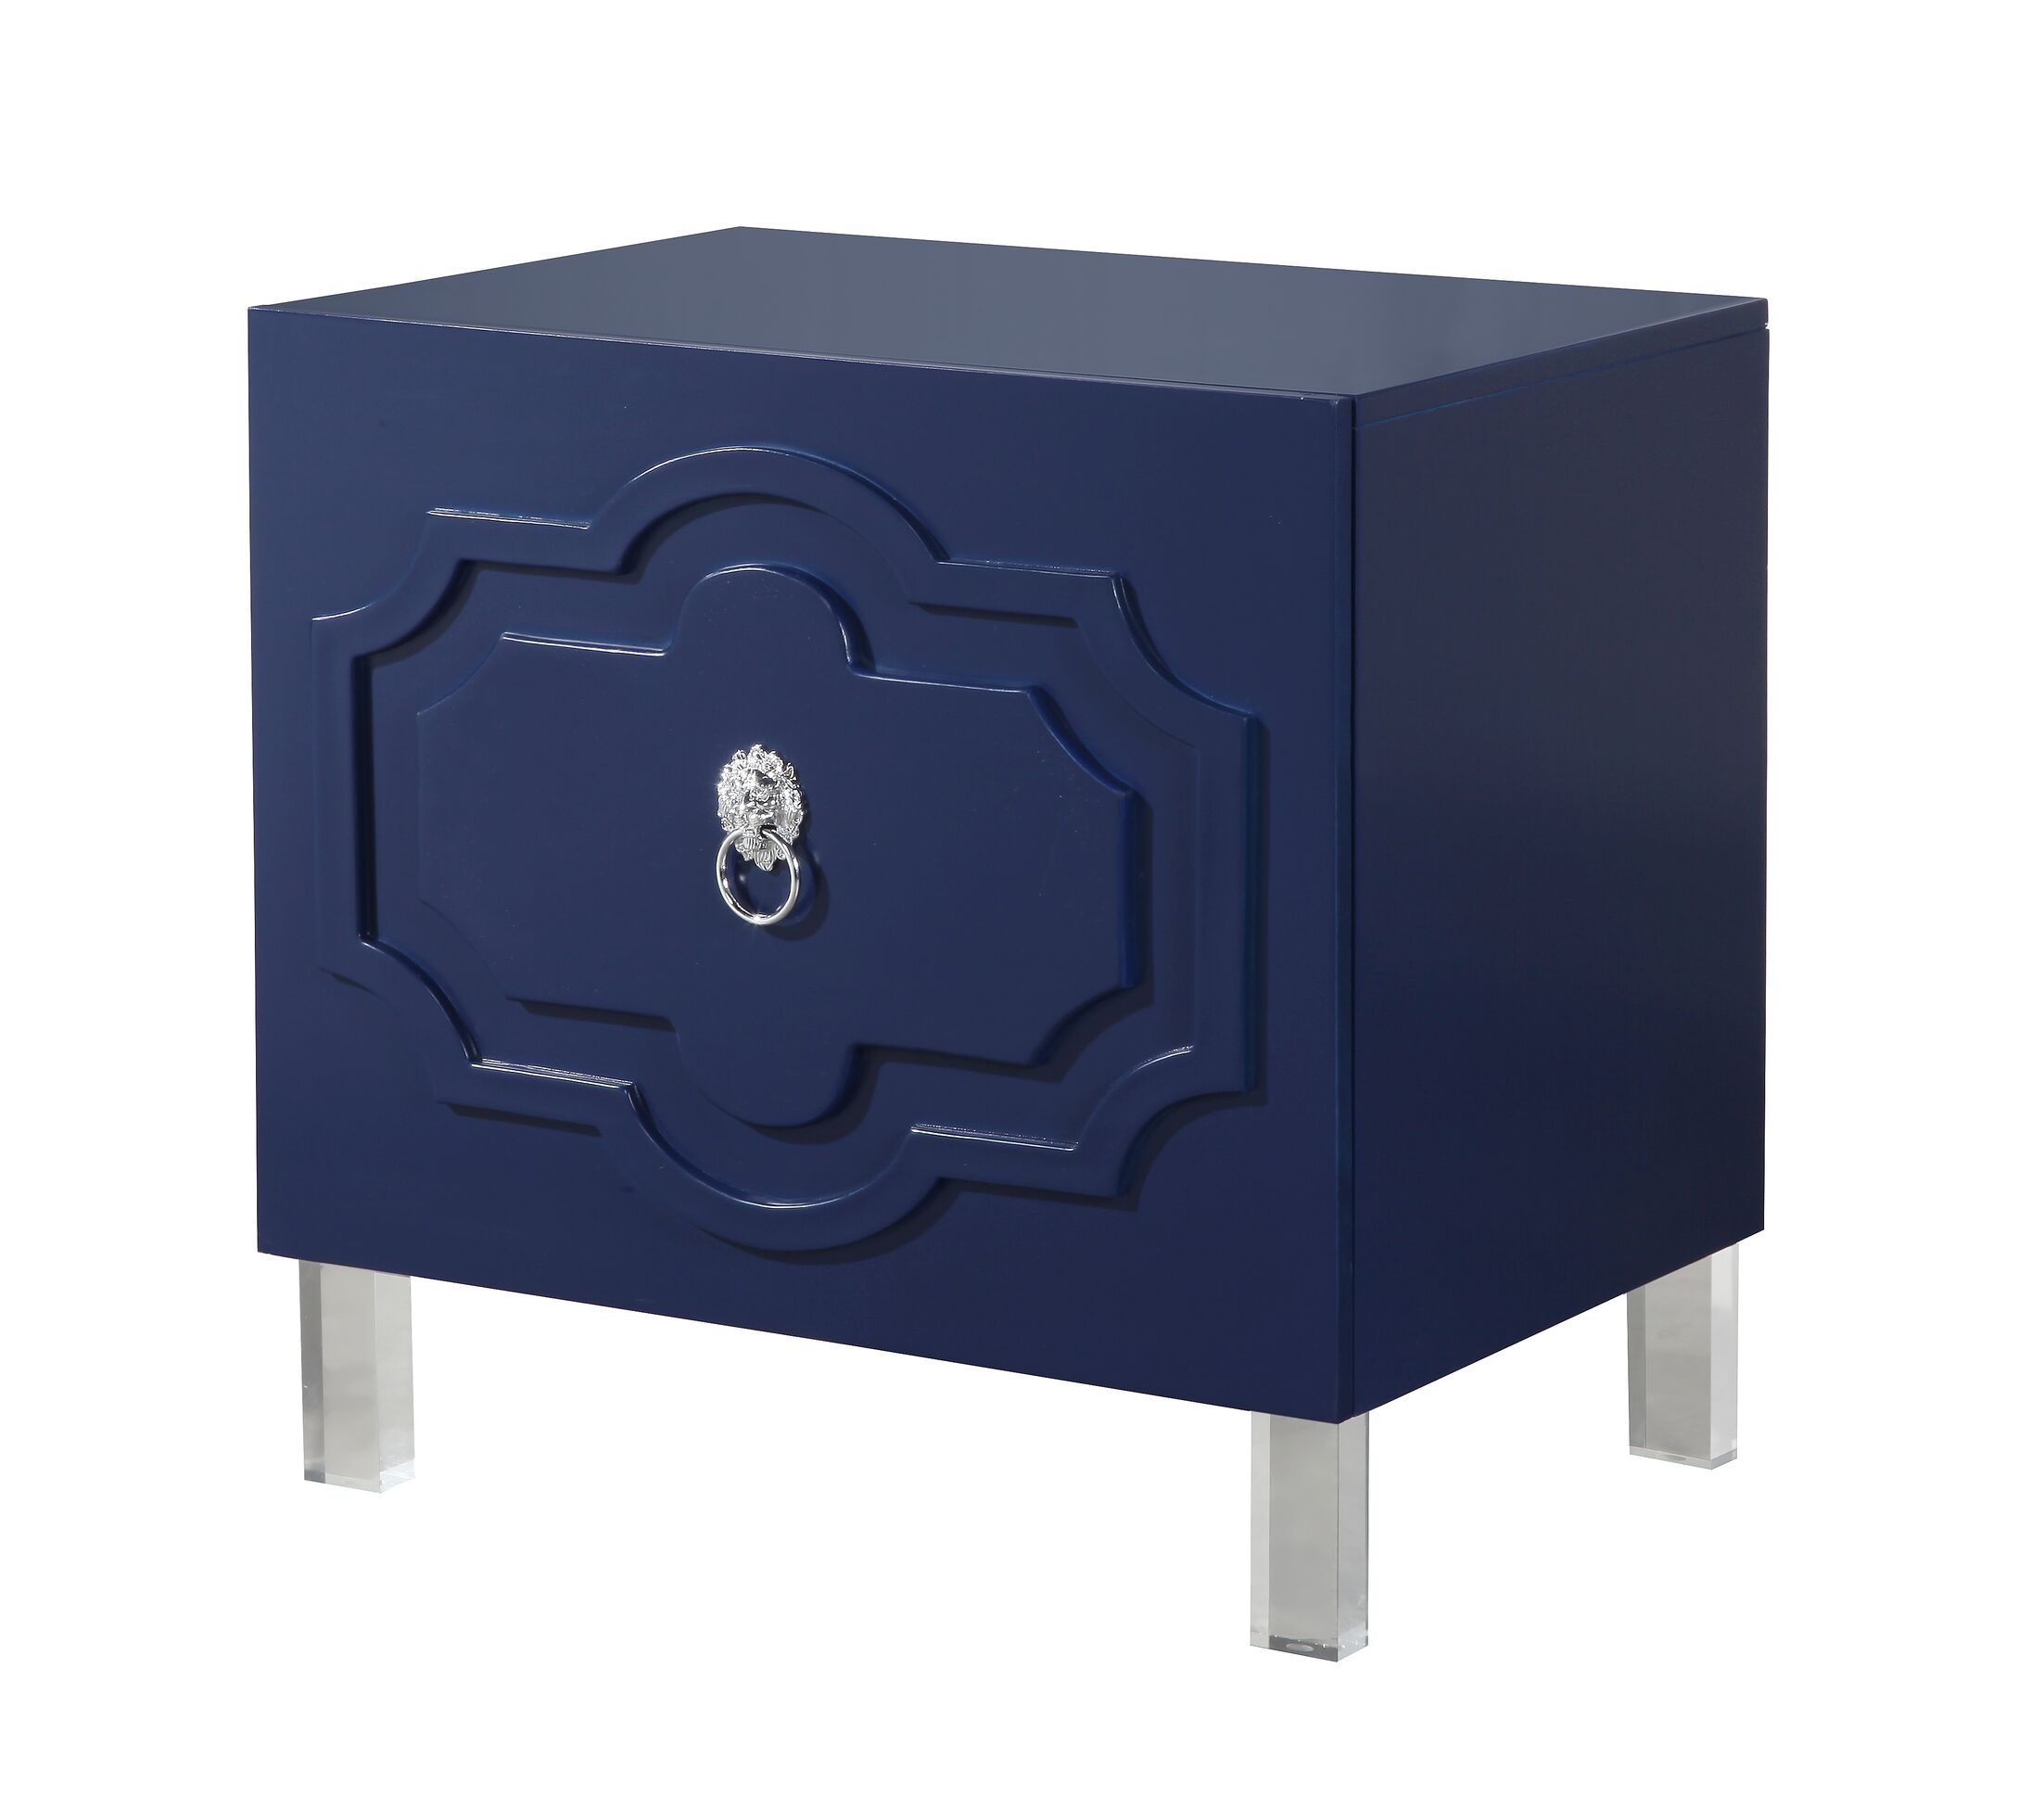 Trinh End Table Color: Navy Blue